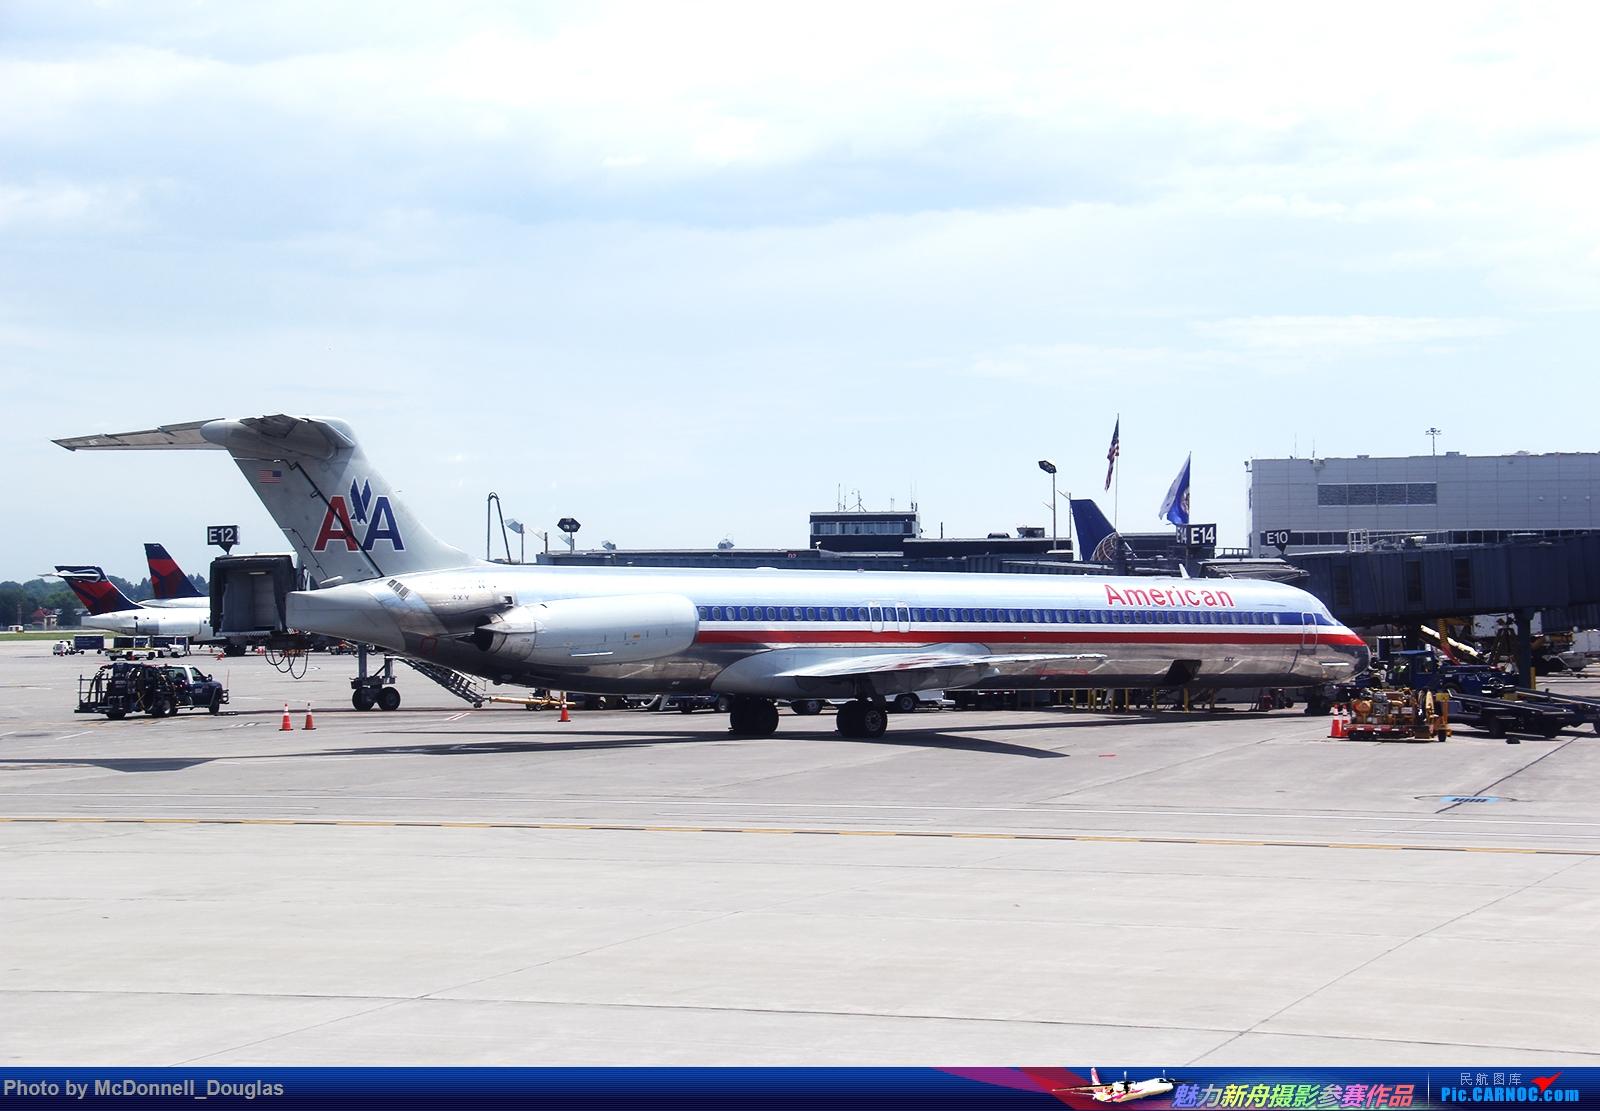 Re:[原创]【上海飞友会】图会很多,也有很多驾驶舱,杂七杂八的美帝,梦寐以求的圣马丁,这更绝不弃贴【驾驶舱已出现】 MCDONNELL DOUGLAS MD-83(DC-9-SUPER80-83) N966TW 美国明尼阿波利斯—圣保罗机场